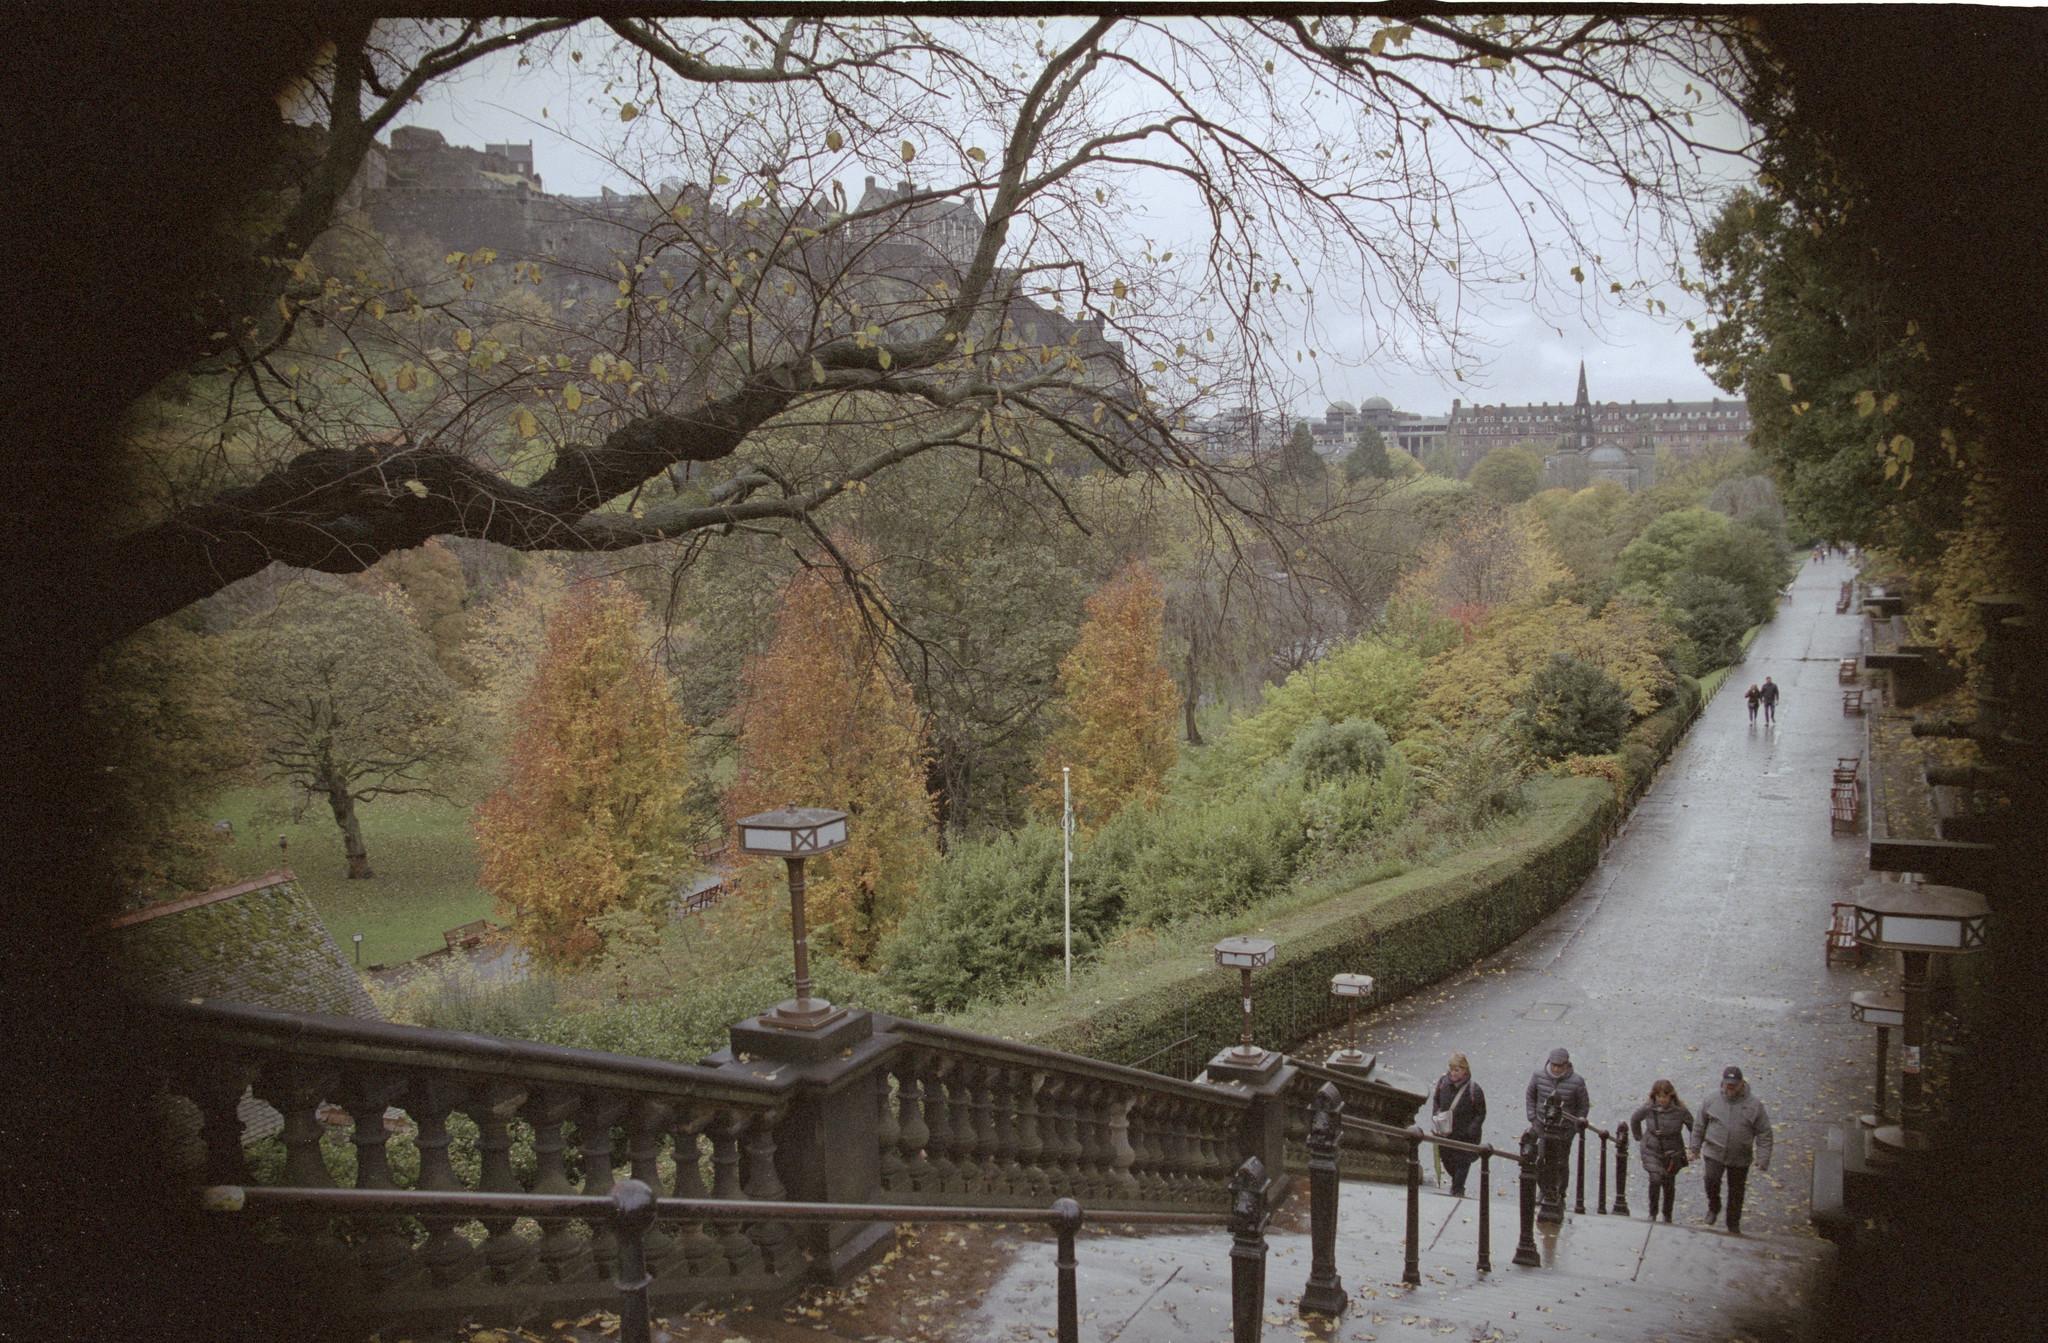 Walking down into a park in Edinburgh Scotland